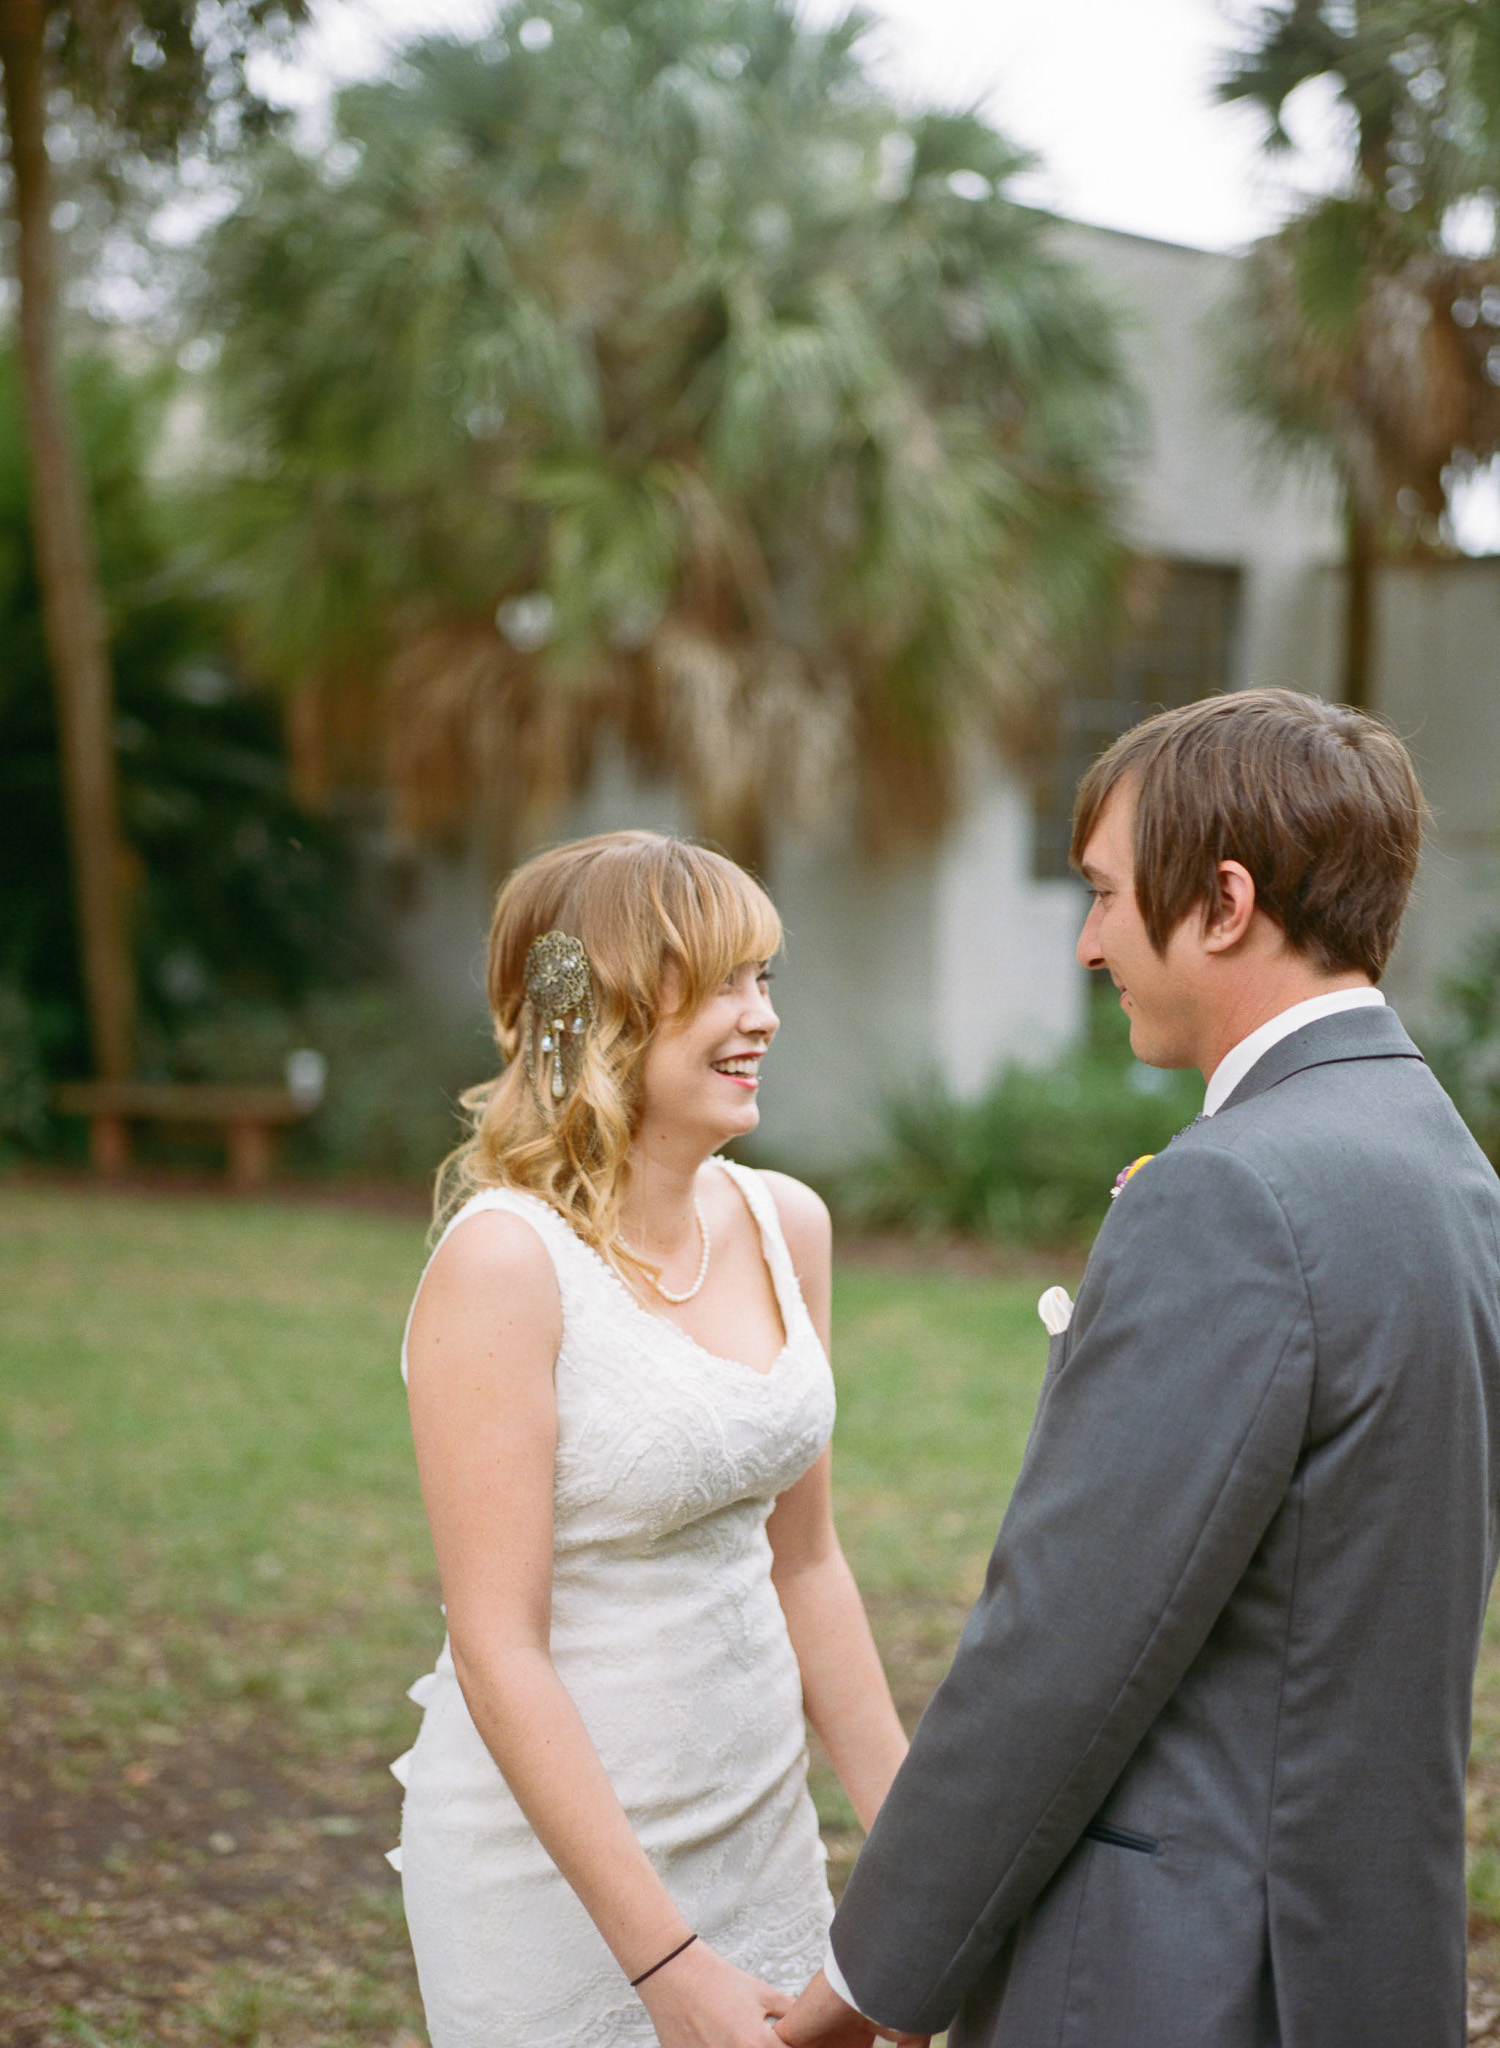 Christina-Matt-Maitland-Art-Center-Wedding38.JPG